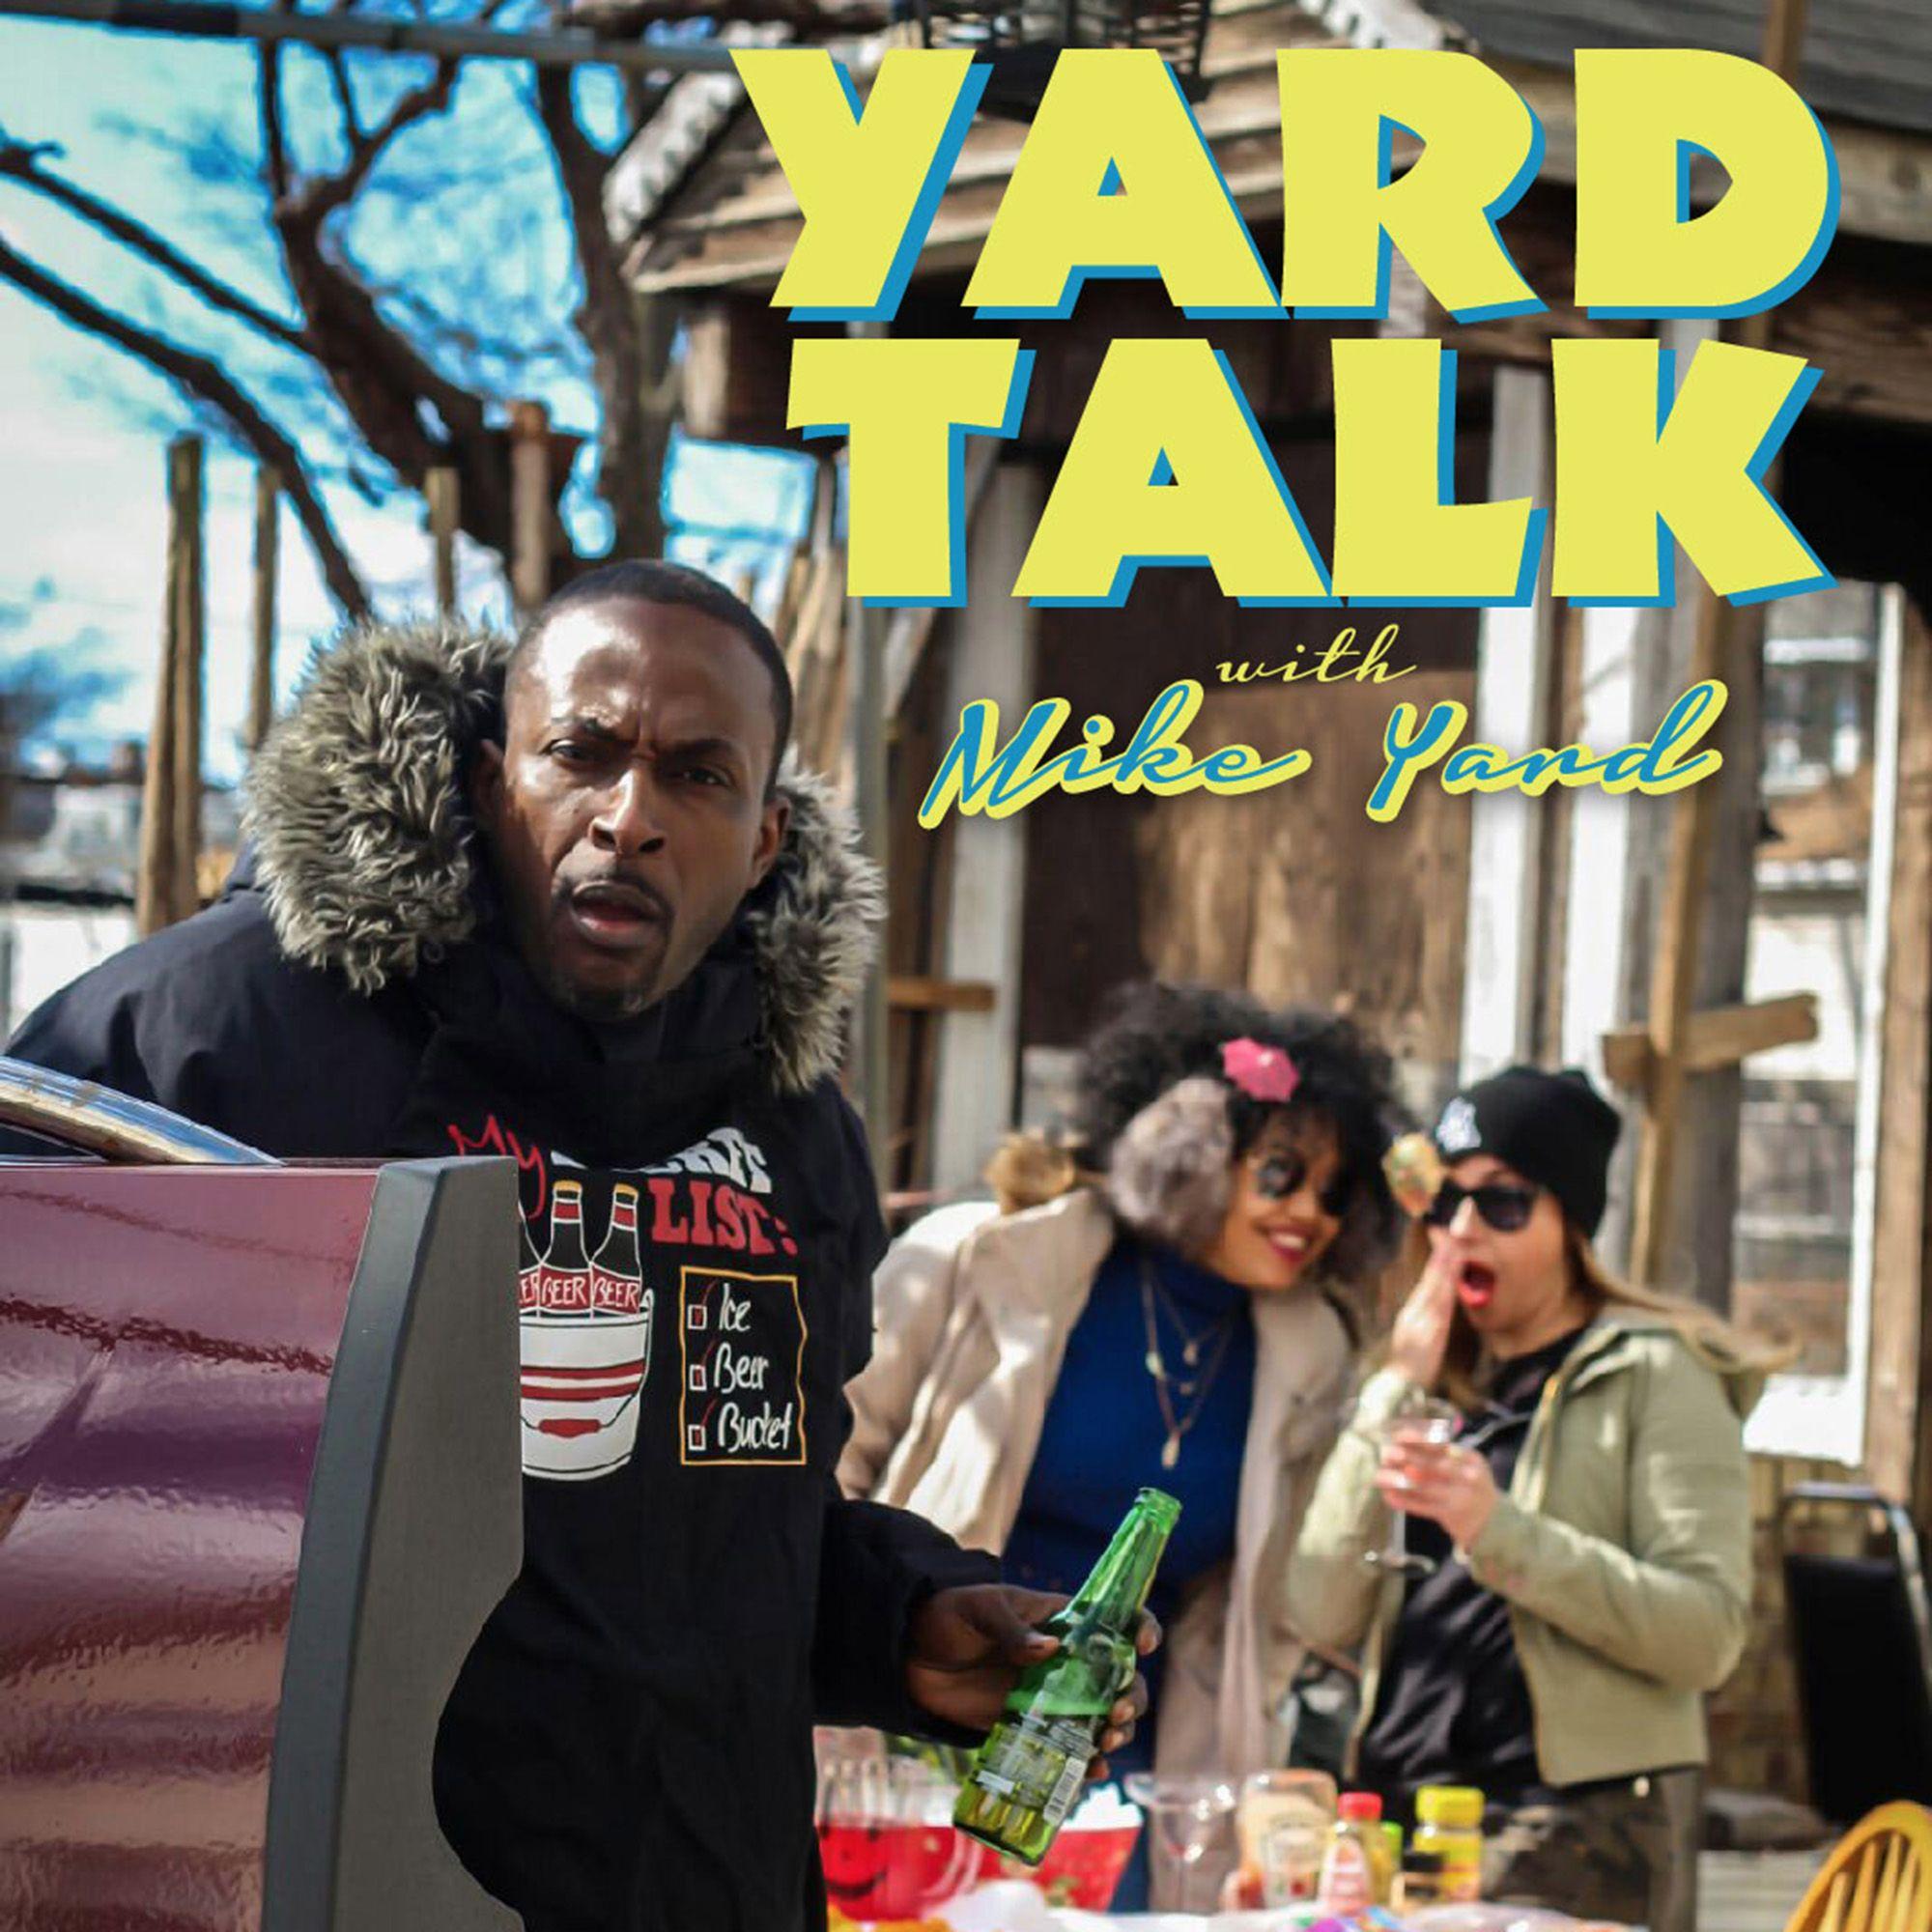 Yard Talk